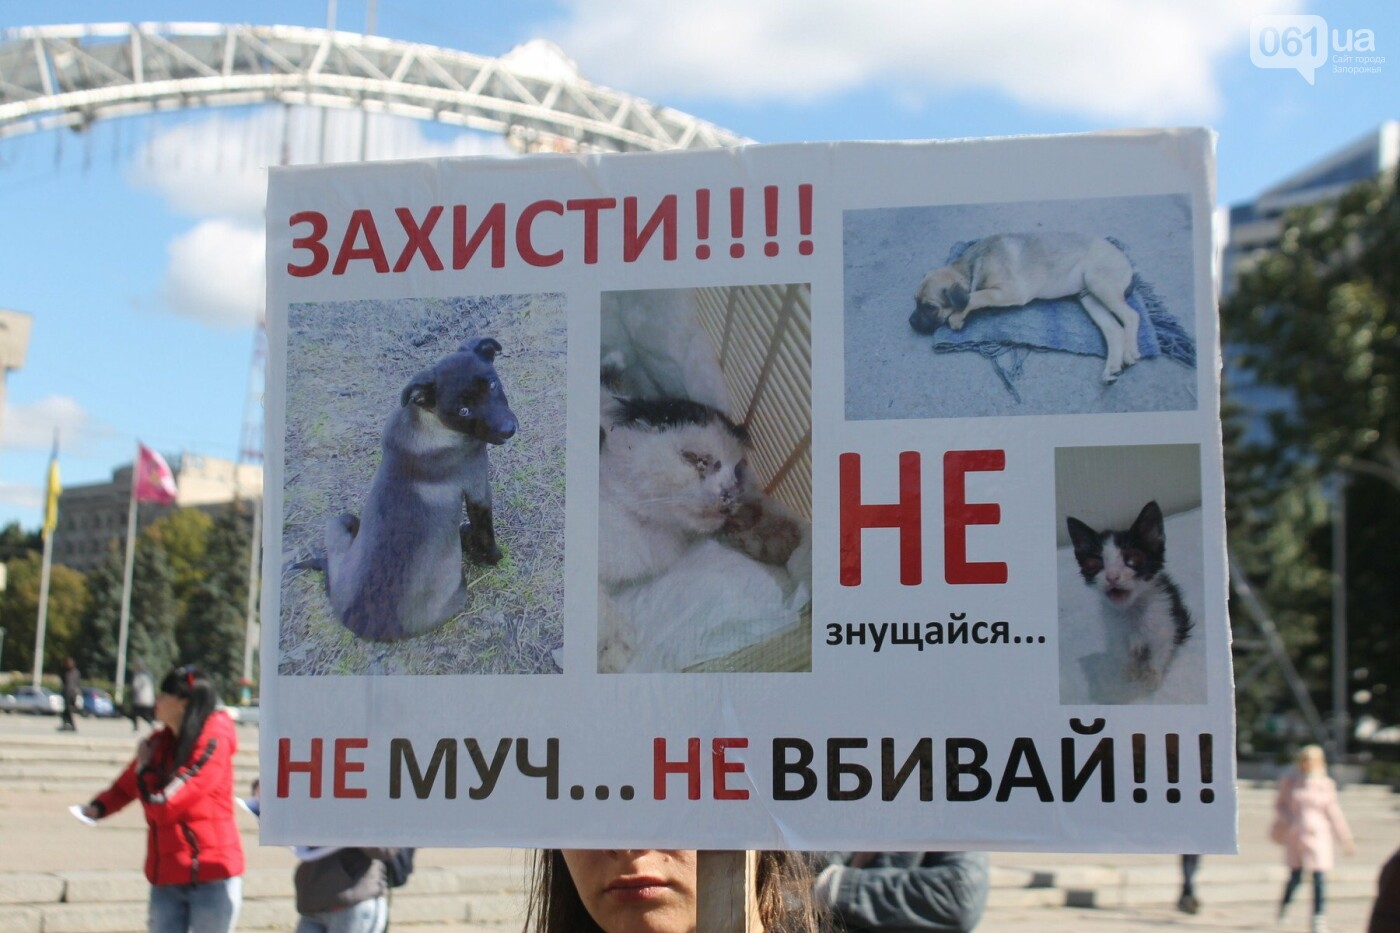 «Защити! Не мучай»: в Запорожье провели марш за права животных, – ФОТОРЕПОРТАЖ, ВИДЕО, фото-4